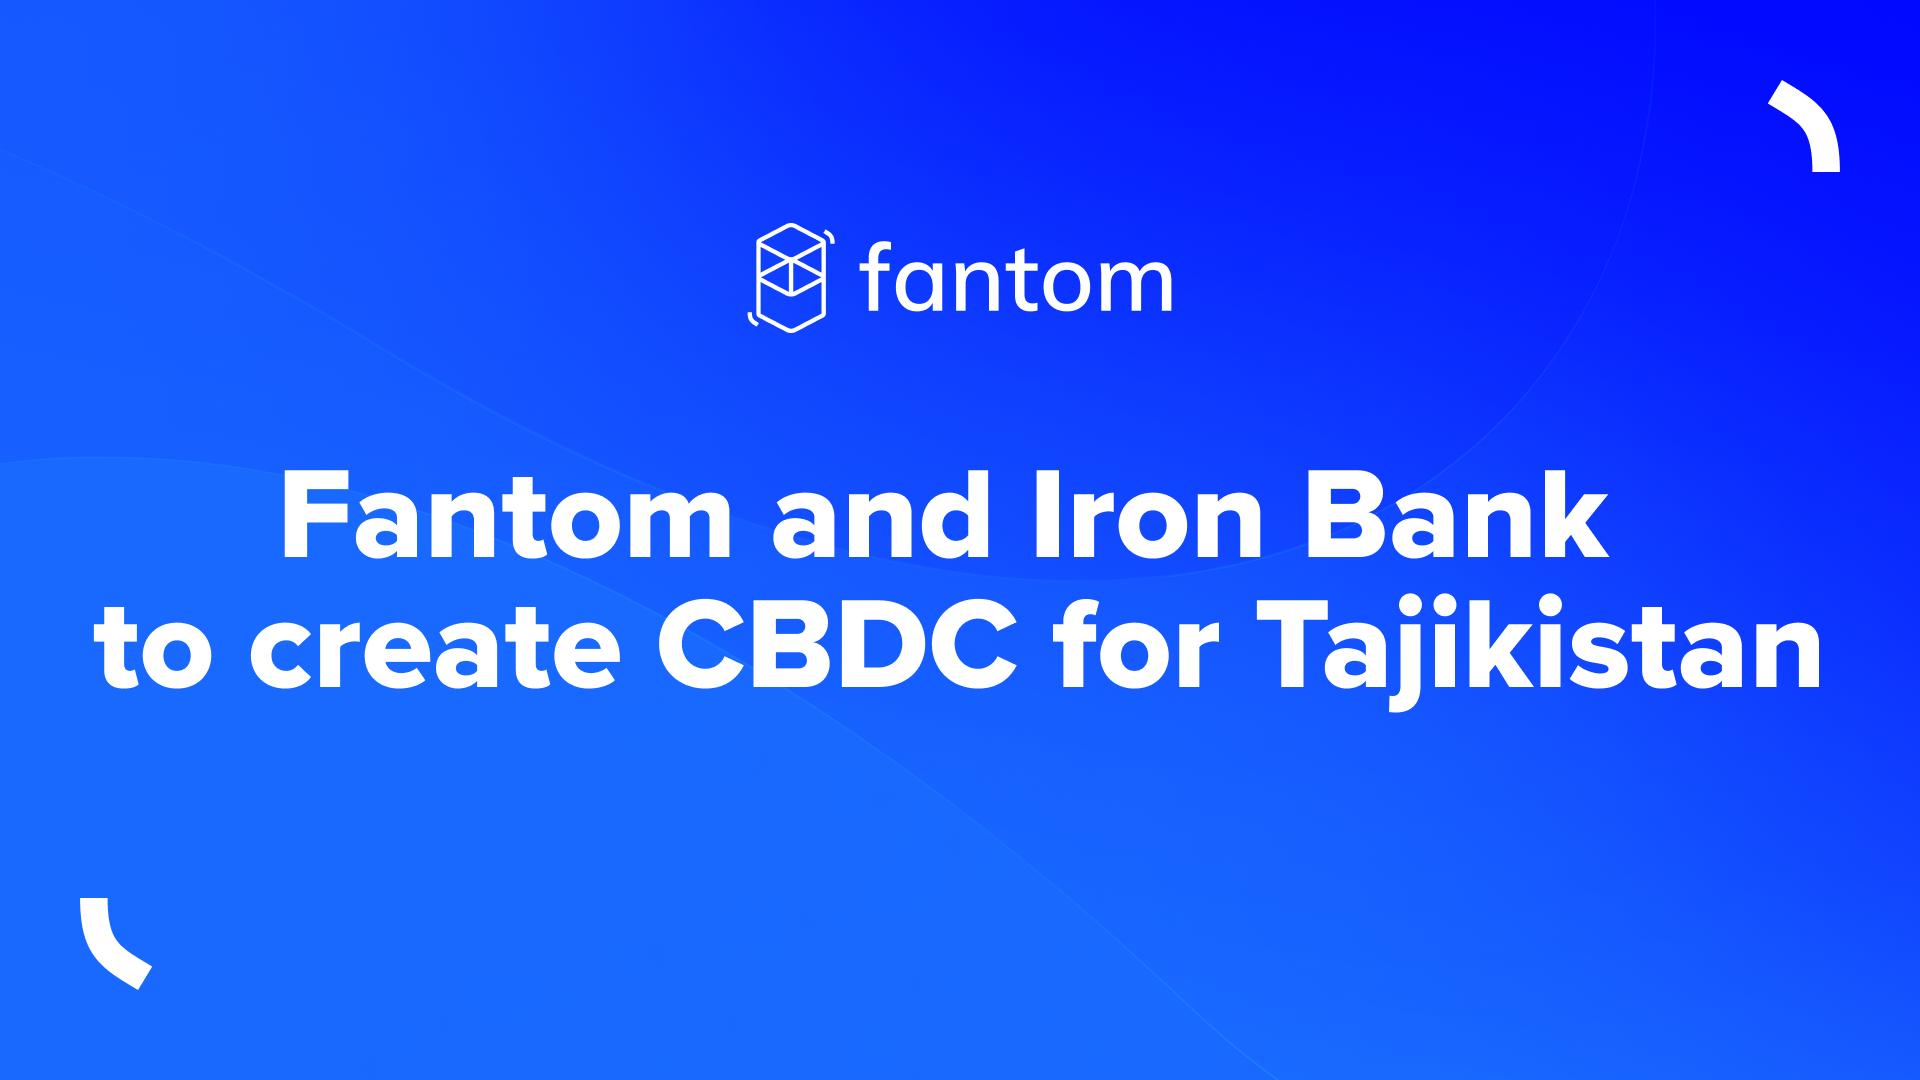 Fantom (FTM) hỗ trợ Tajikistan triển khai CBDC